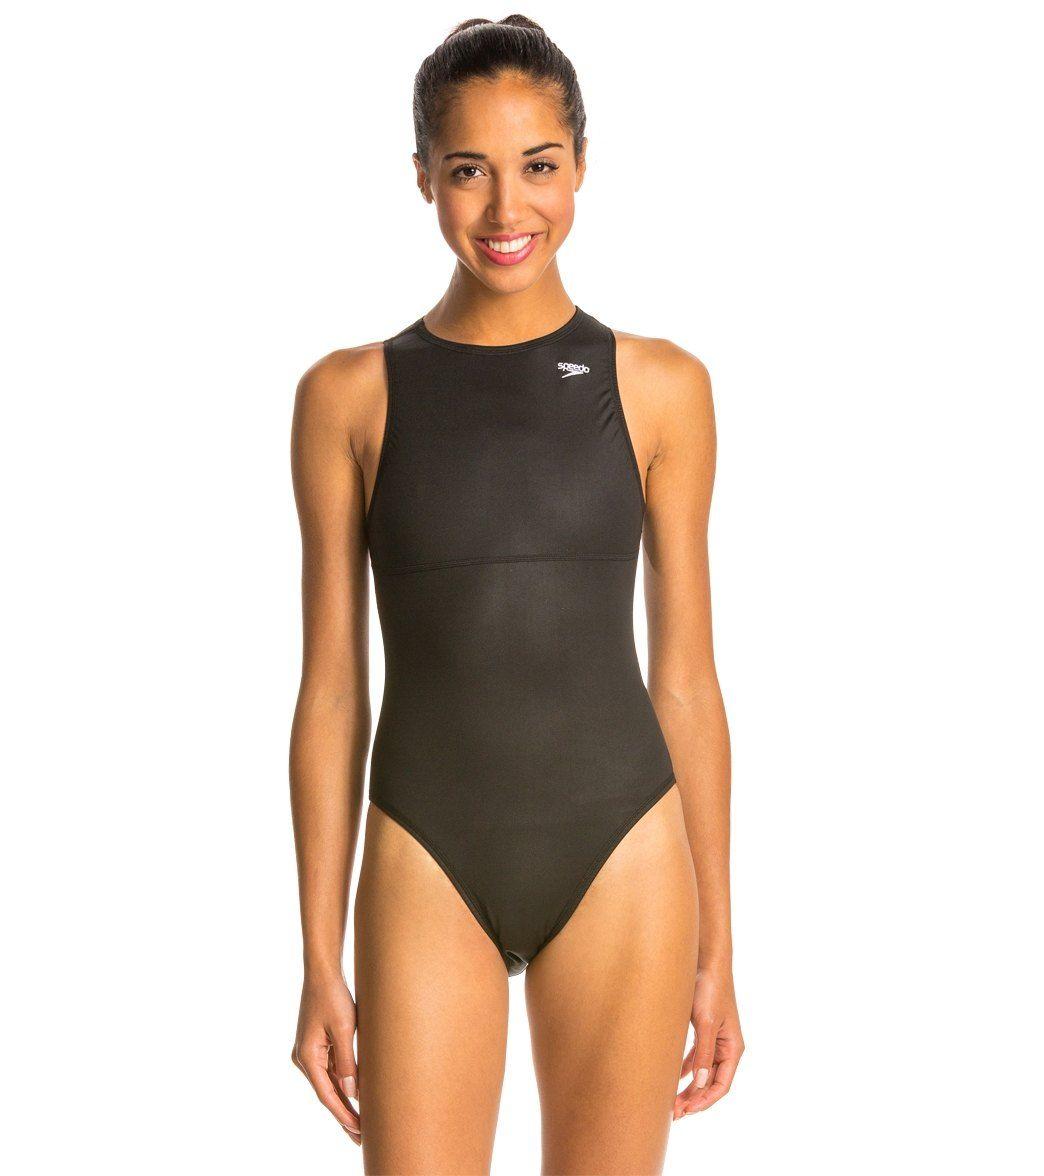 Speedo Women S Endurance Water Polo Suit At Swimoutlet Com The Web S Most Popular Swim Shop Women S One Piece Swimsuits Women Swimsuits Swimsuits